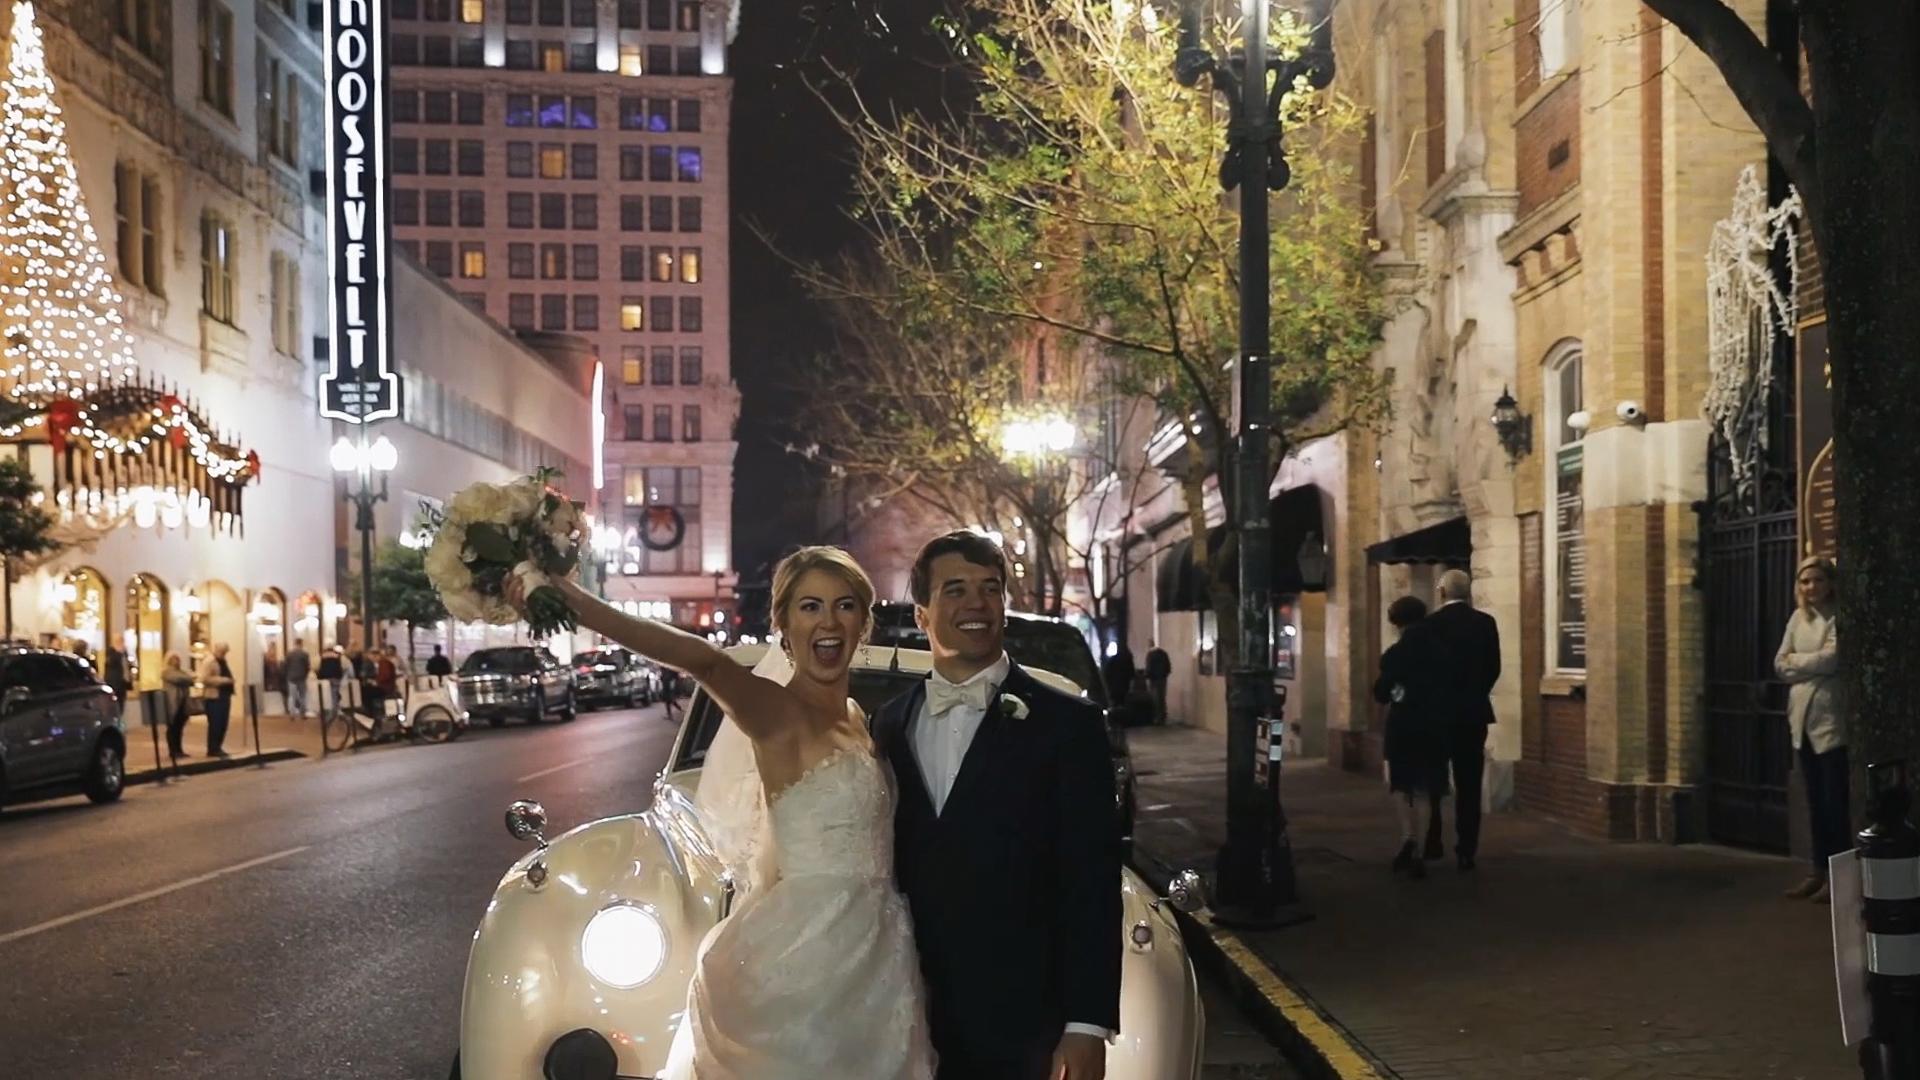 Ritz Carlton Wedding - Bride Film